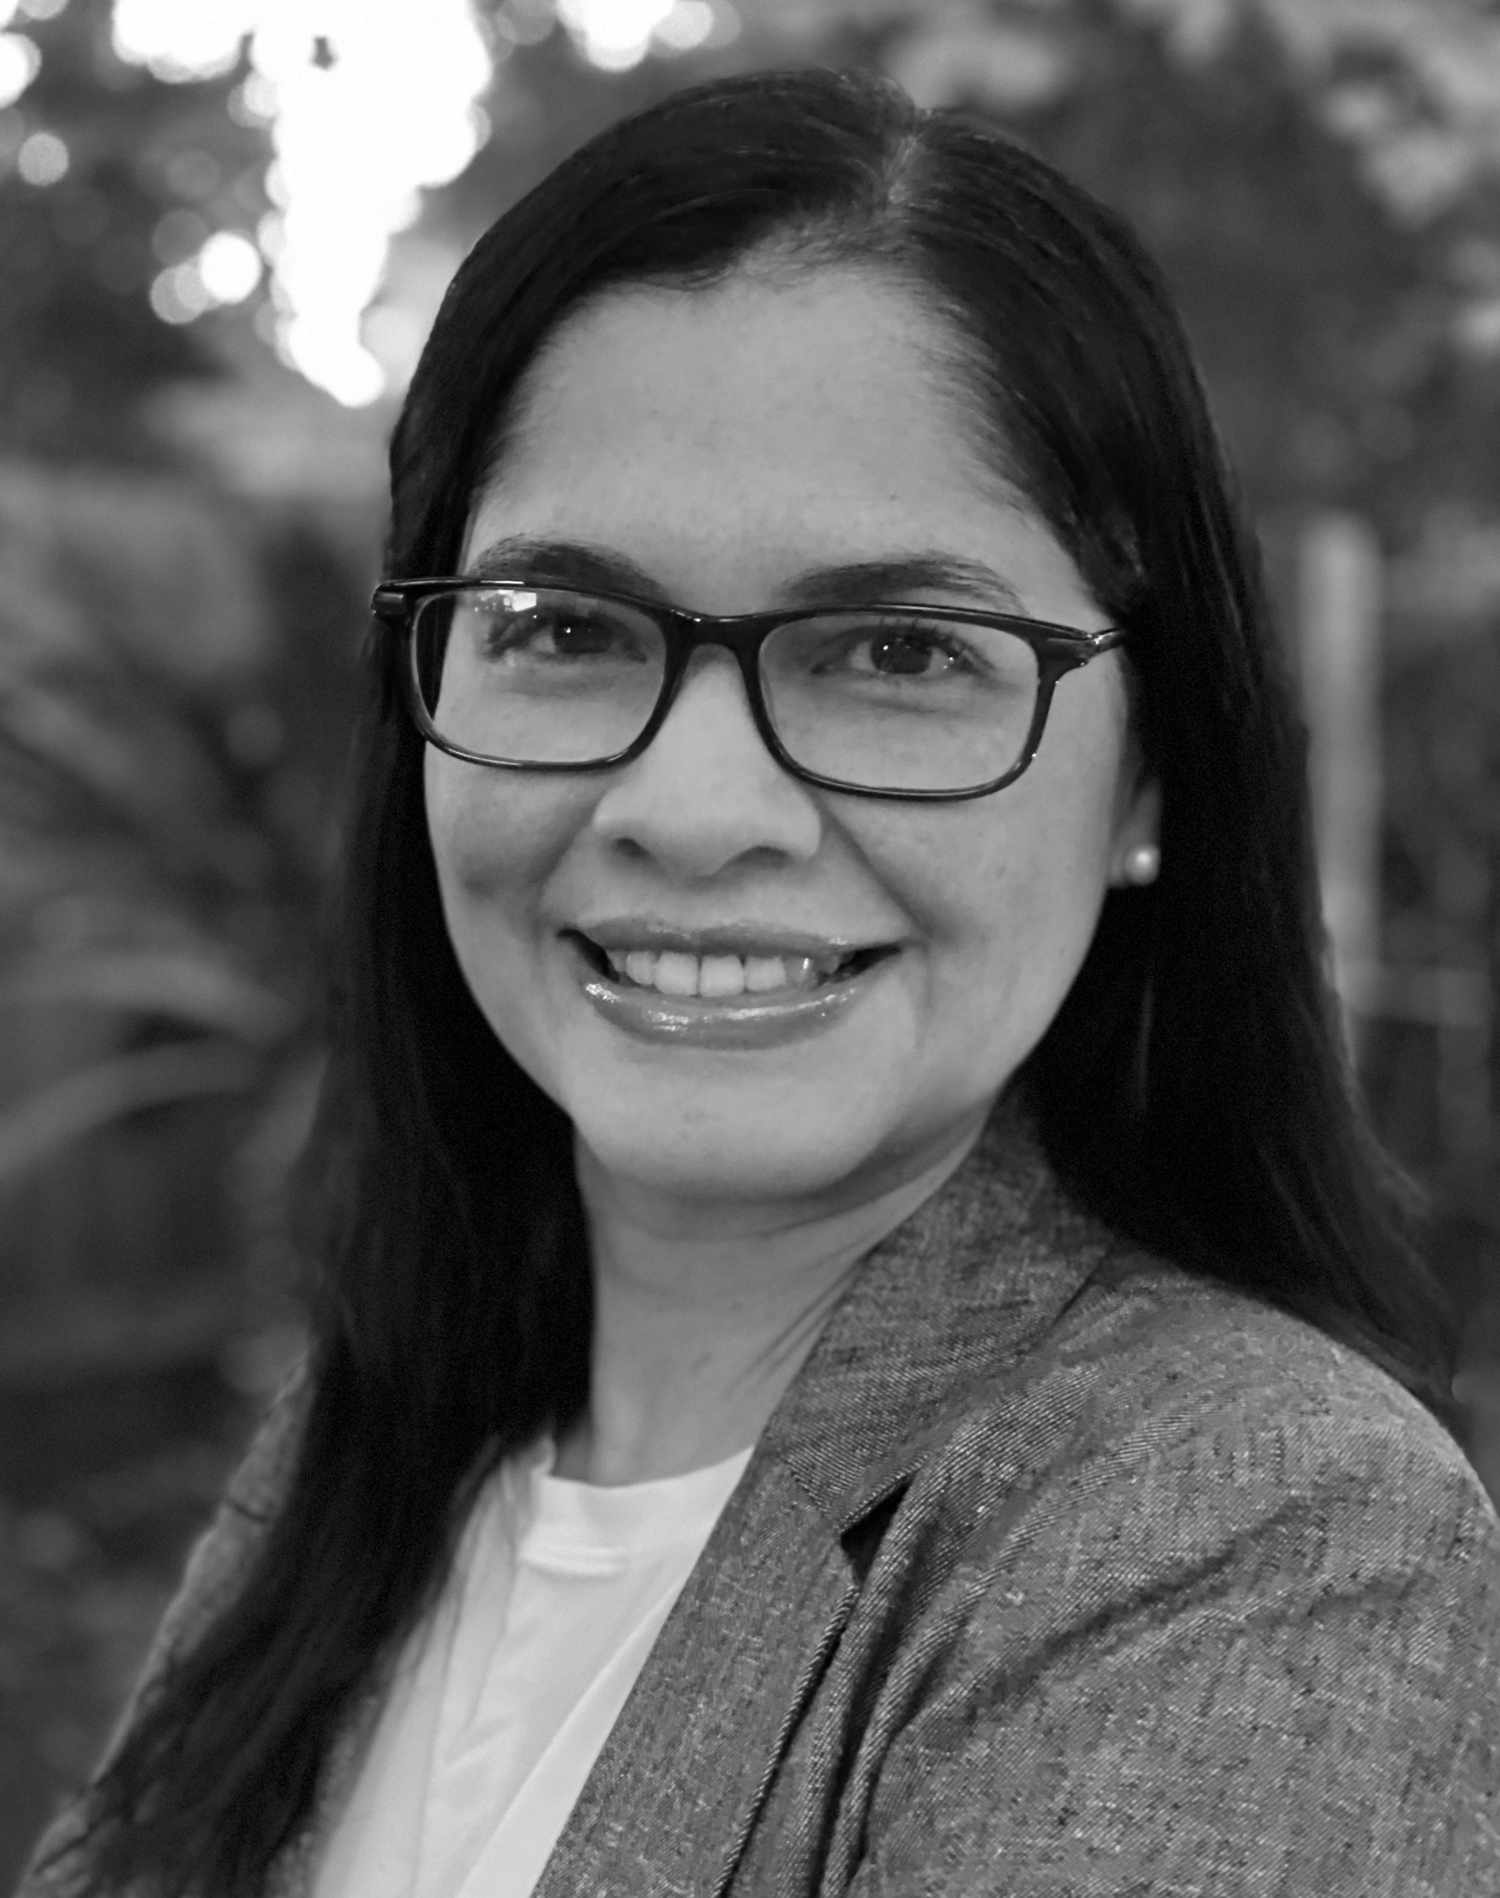 Hildara Araya, Associate Editor